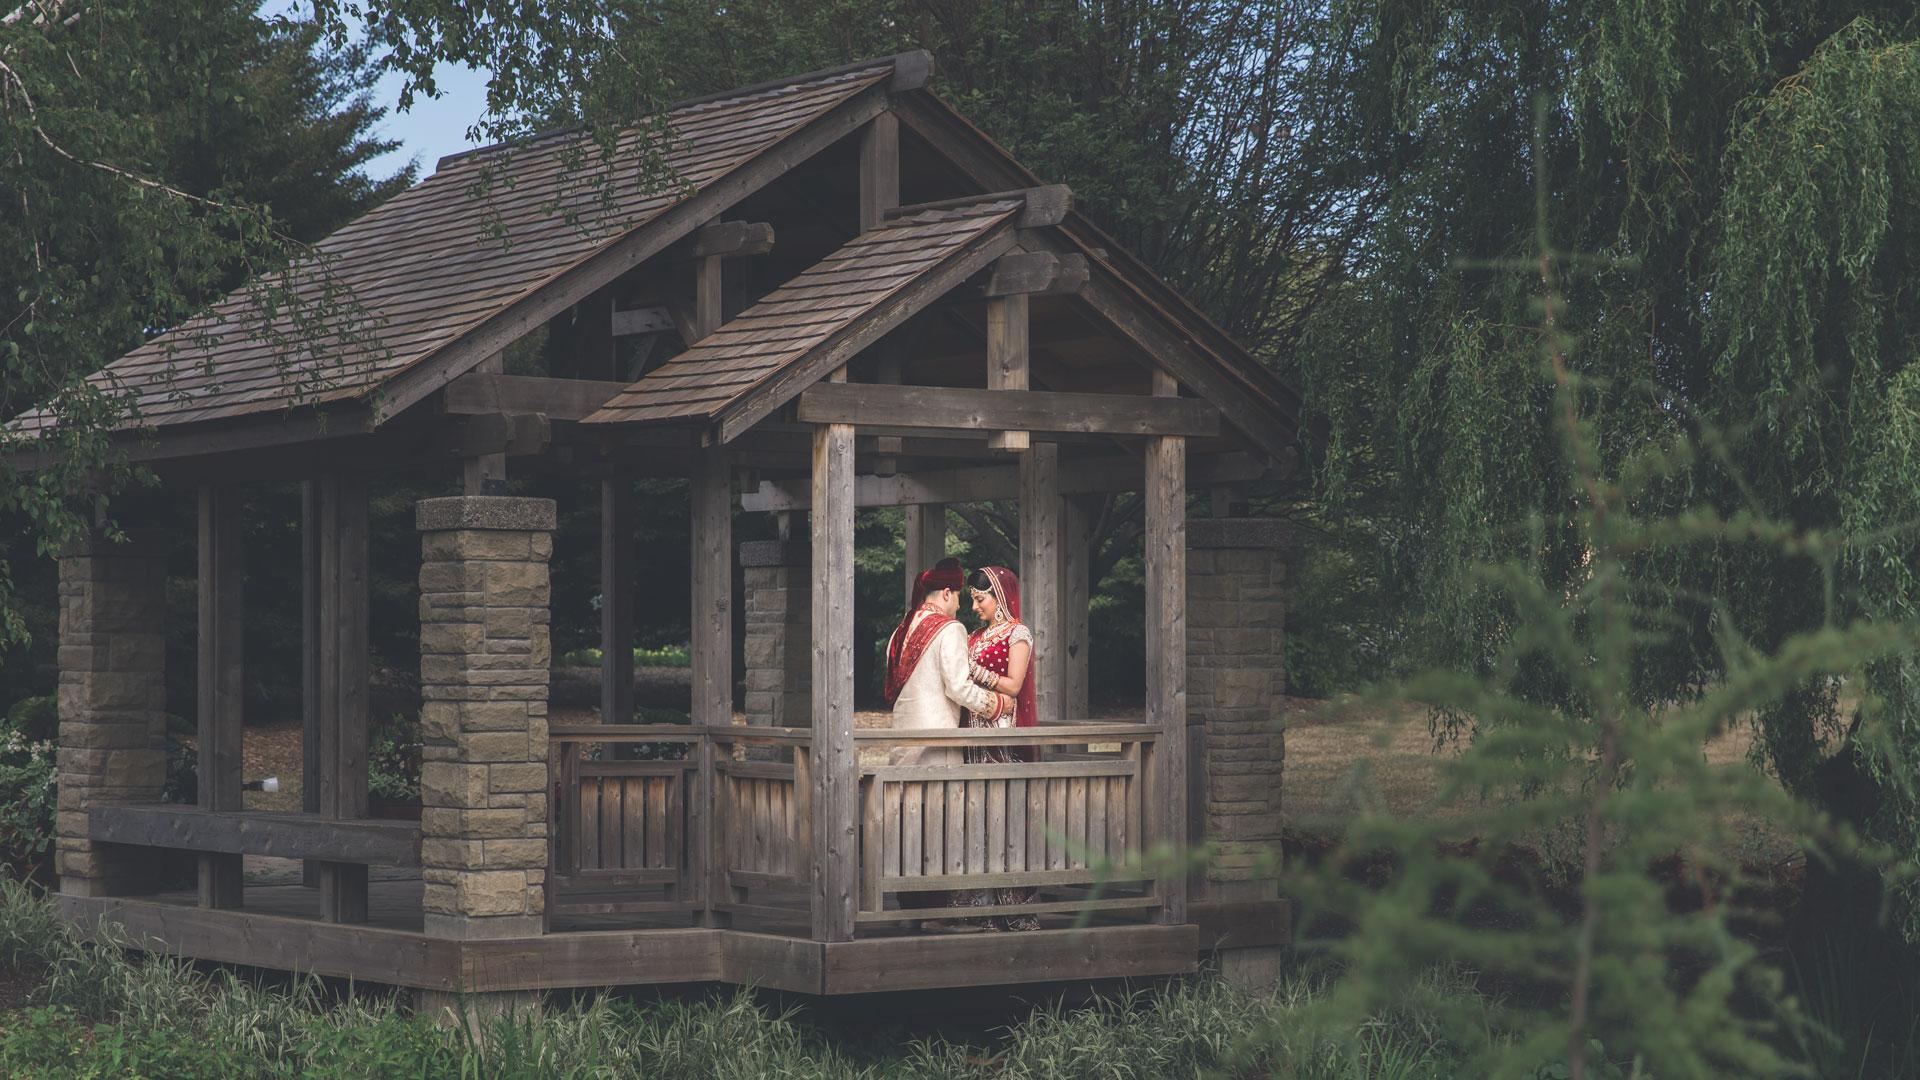 epicskypictures_hindu_ceremony_photography_wedding_photoshoot_pond_etobicoke_park_weddinginspiration_bride_groom_love_married_chicago_ajax_milton_brampton_ottawa_montreal_online